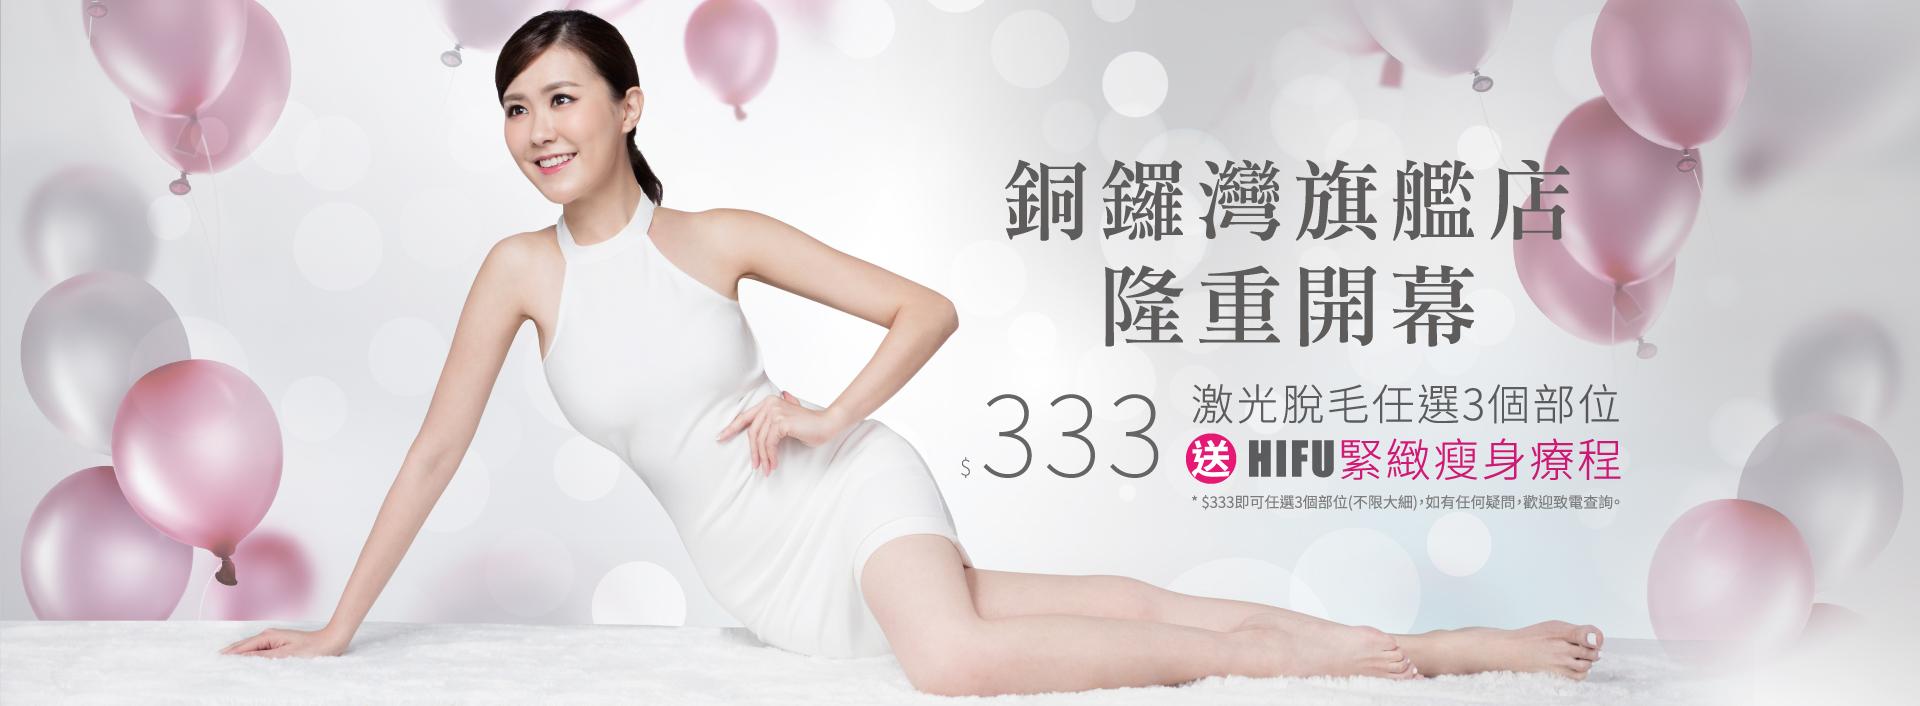 HIFU緊緻瘦身療程